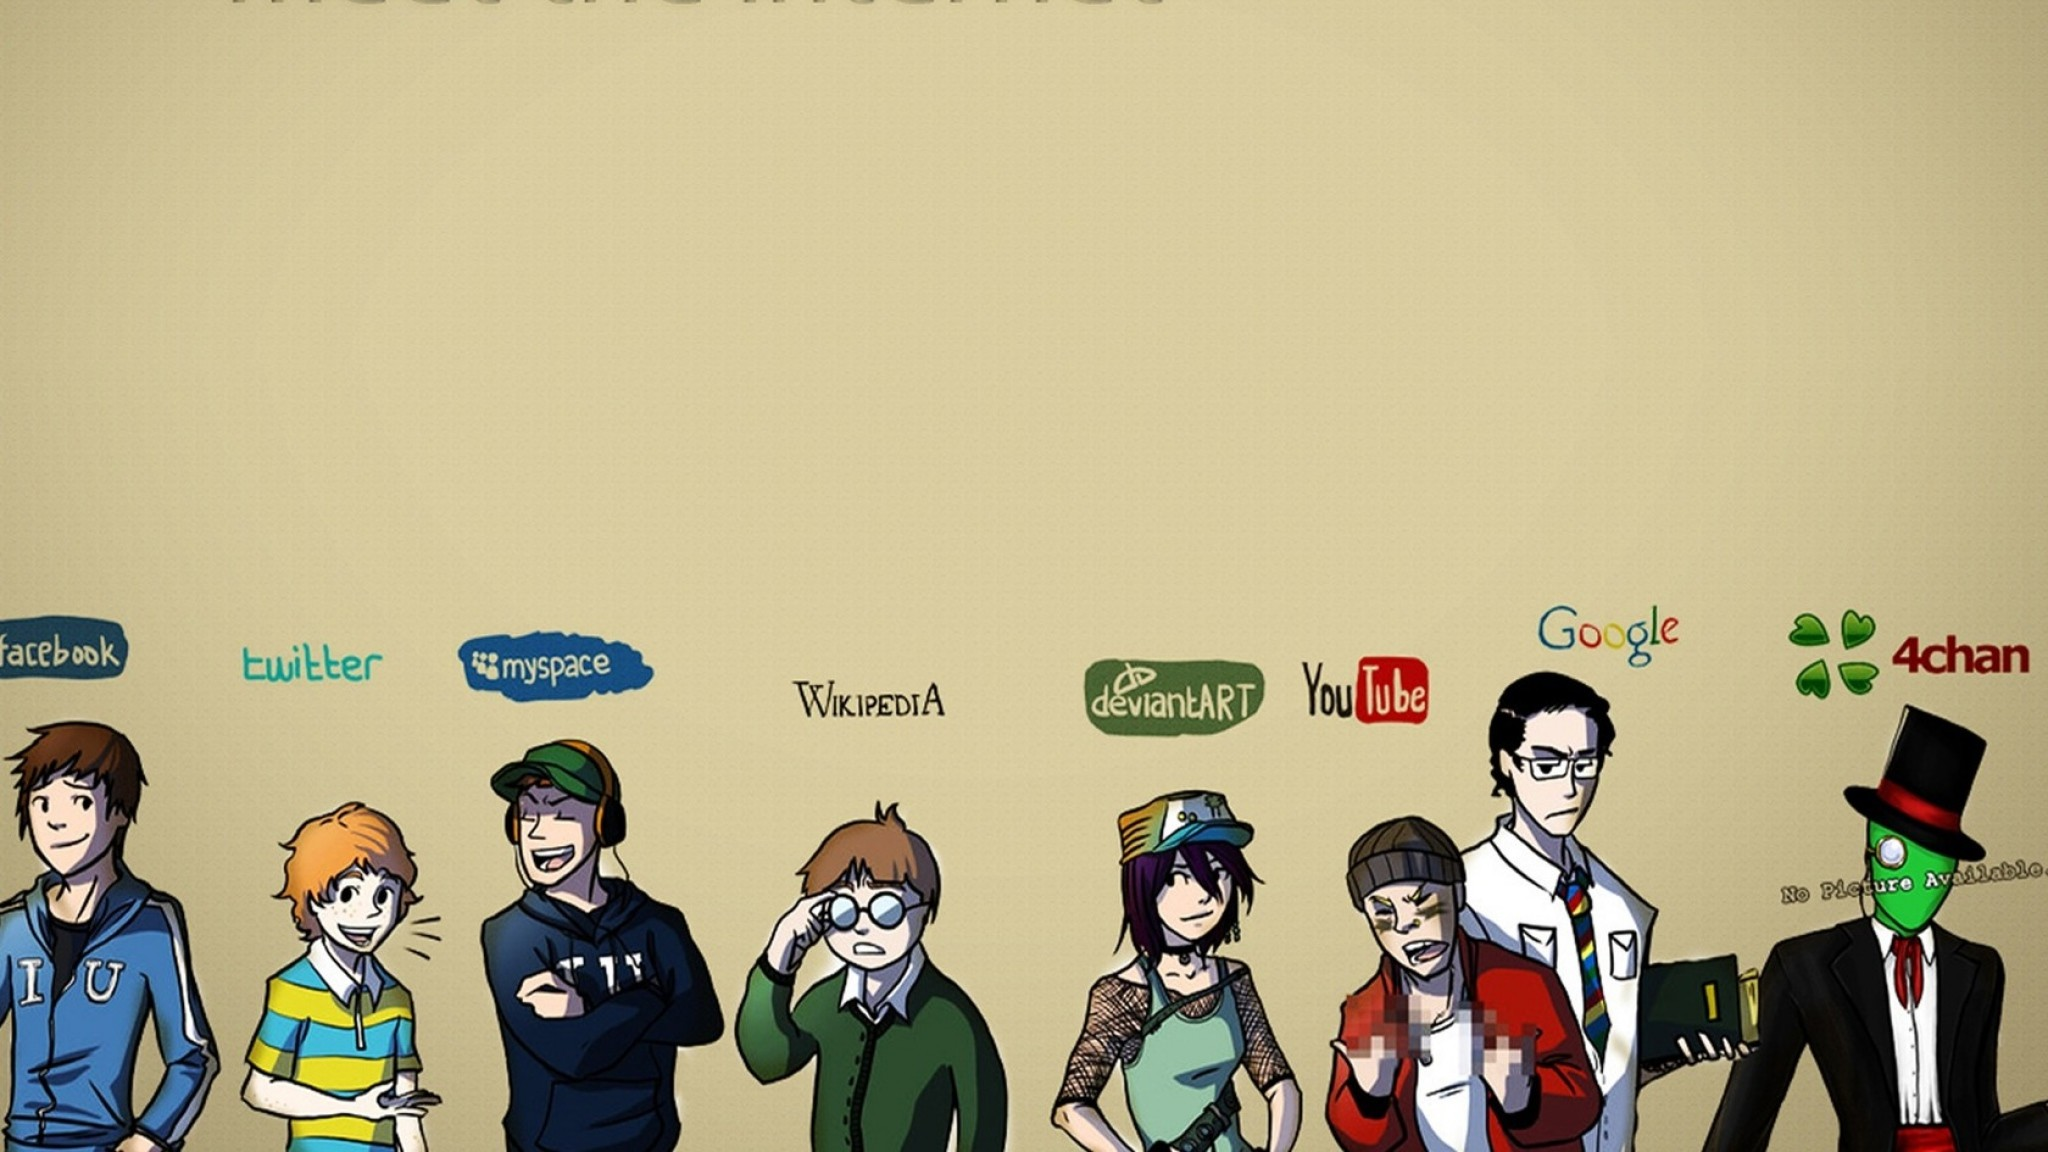 Wallpaper internet, facebook, twitter, myspace, wikipedia .